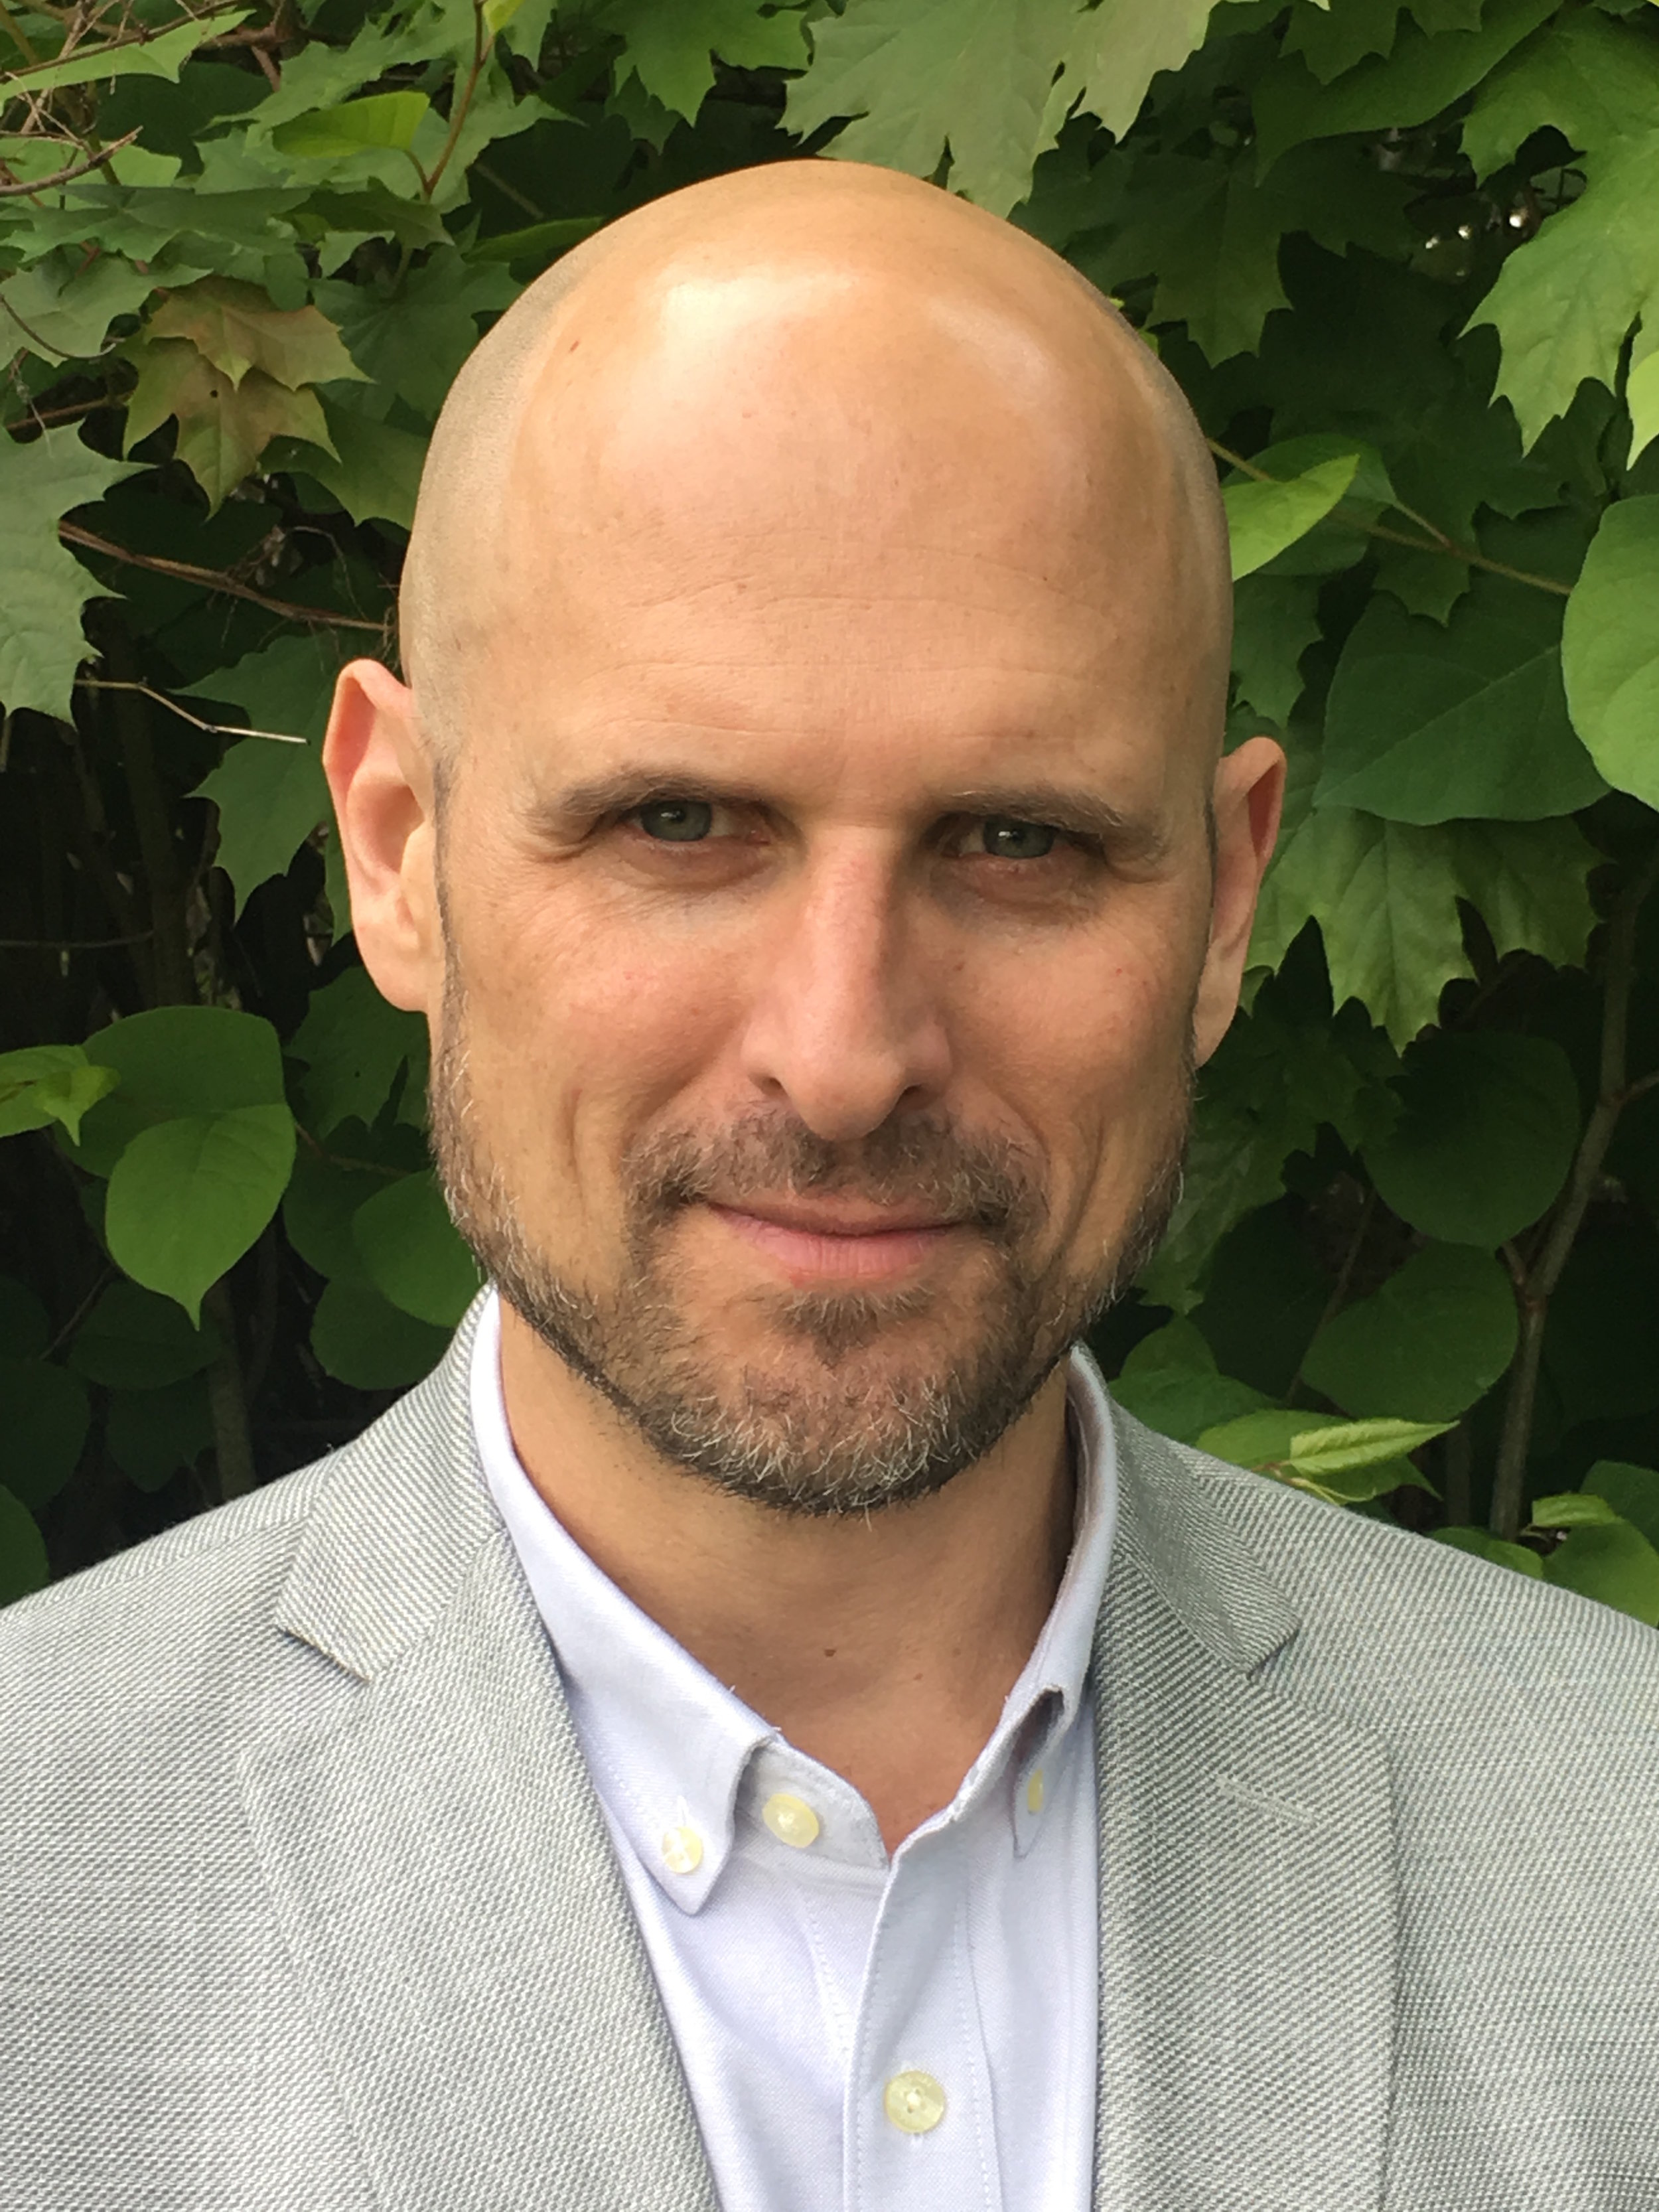 David-Miller-Profile.JPG